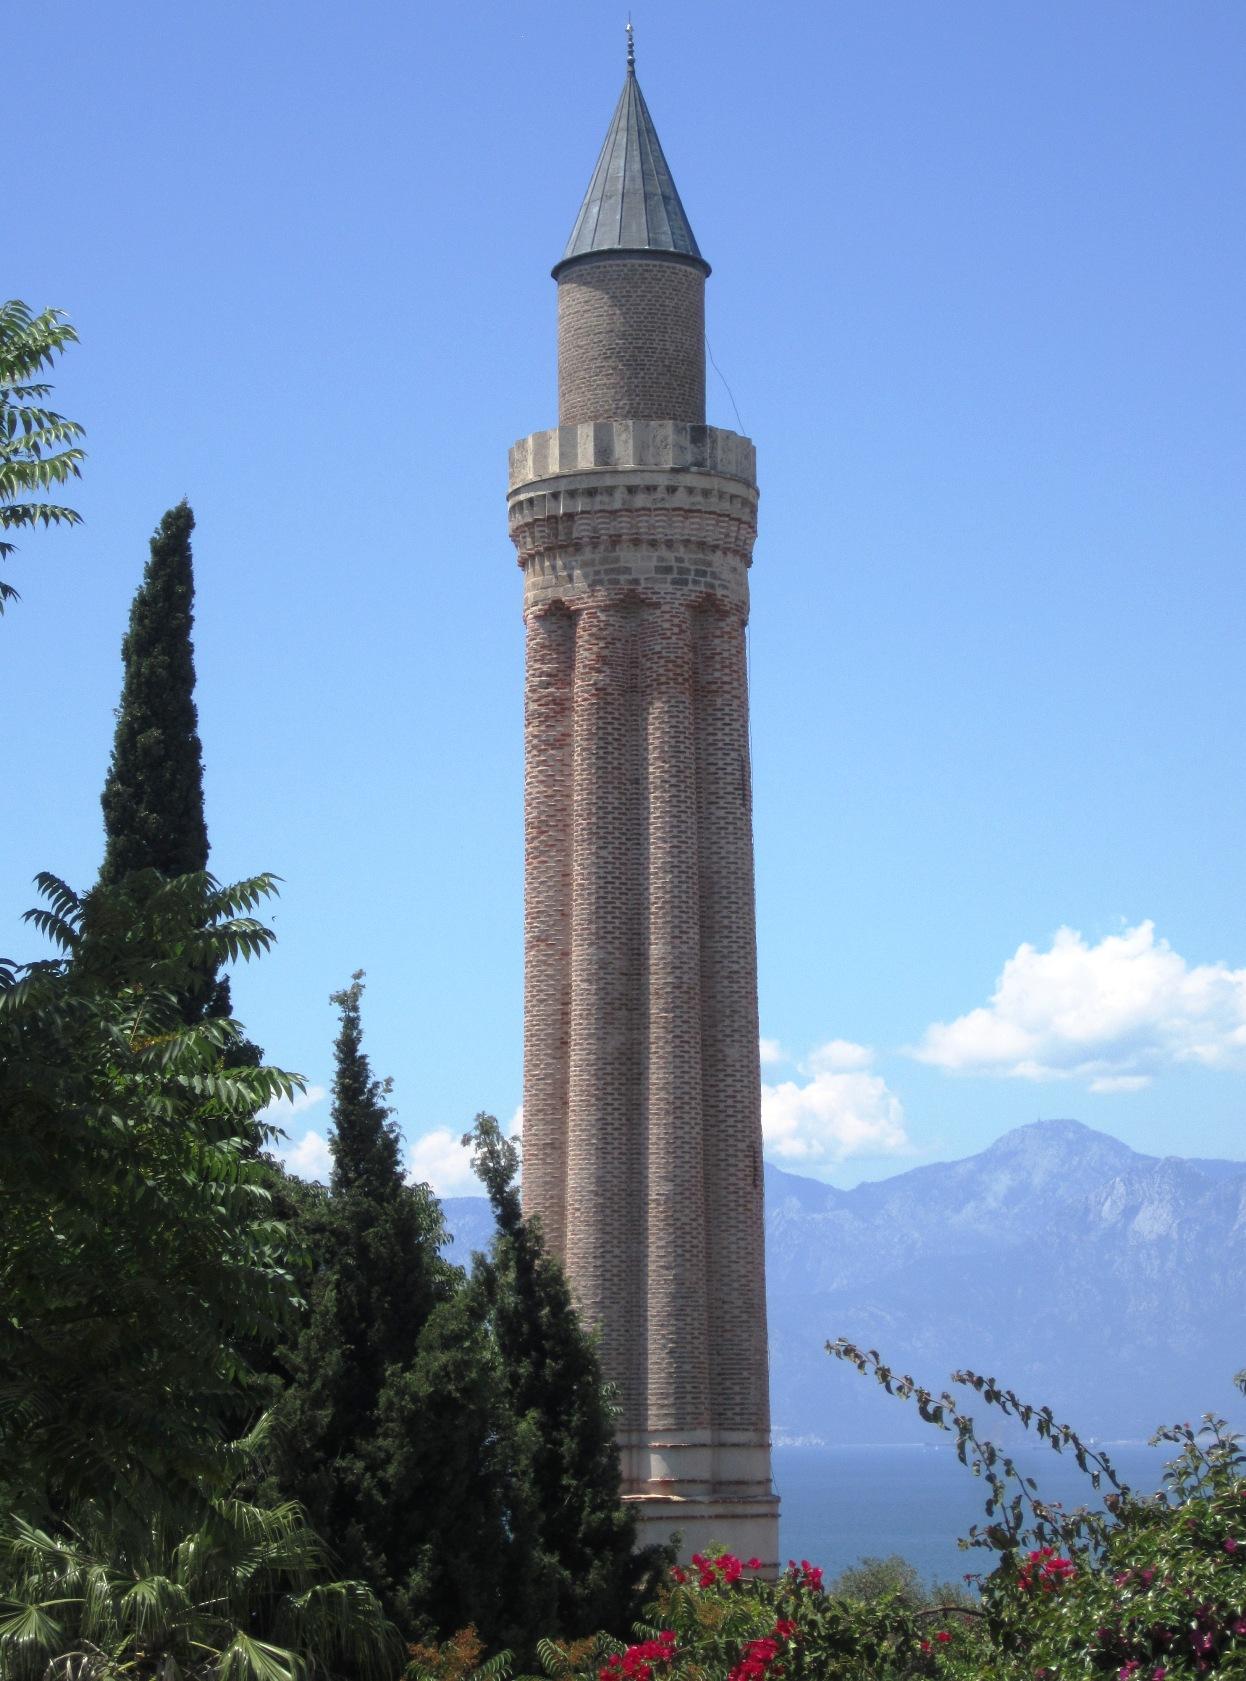 File:Antalya Yivli Minare.JPG - Wikimedia Commons